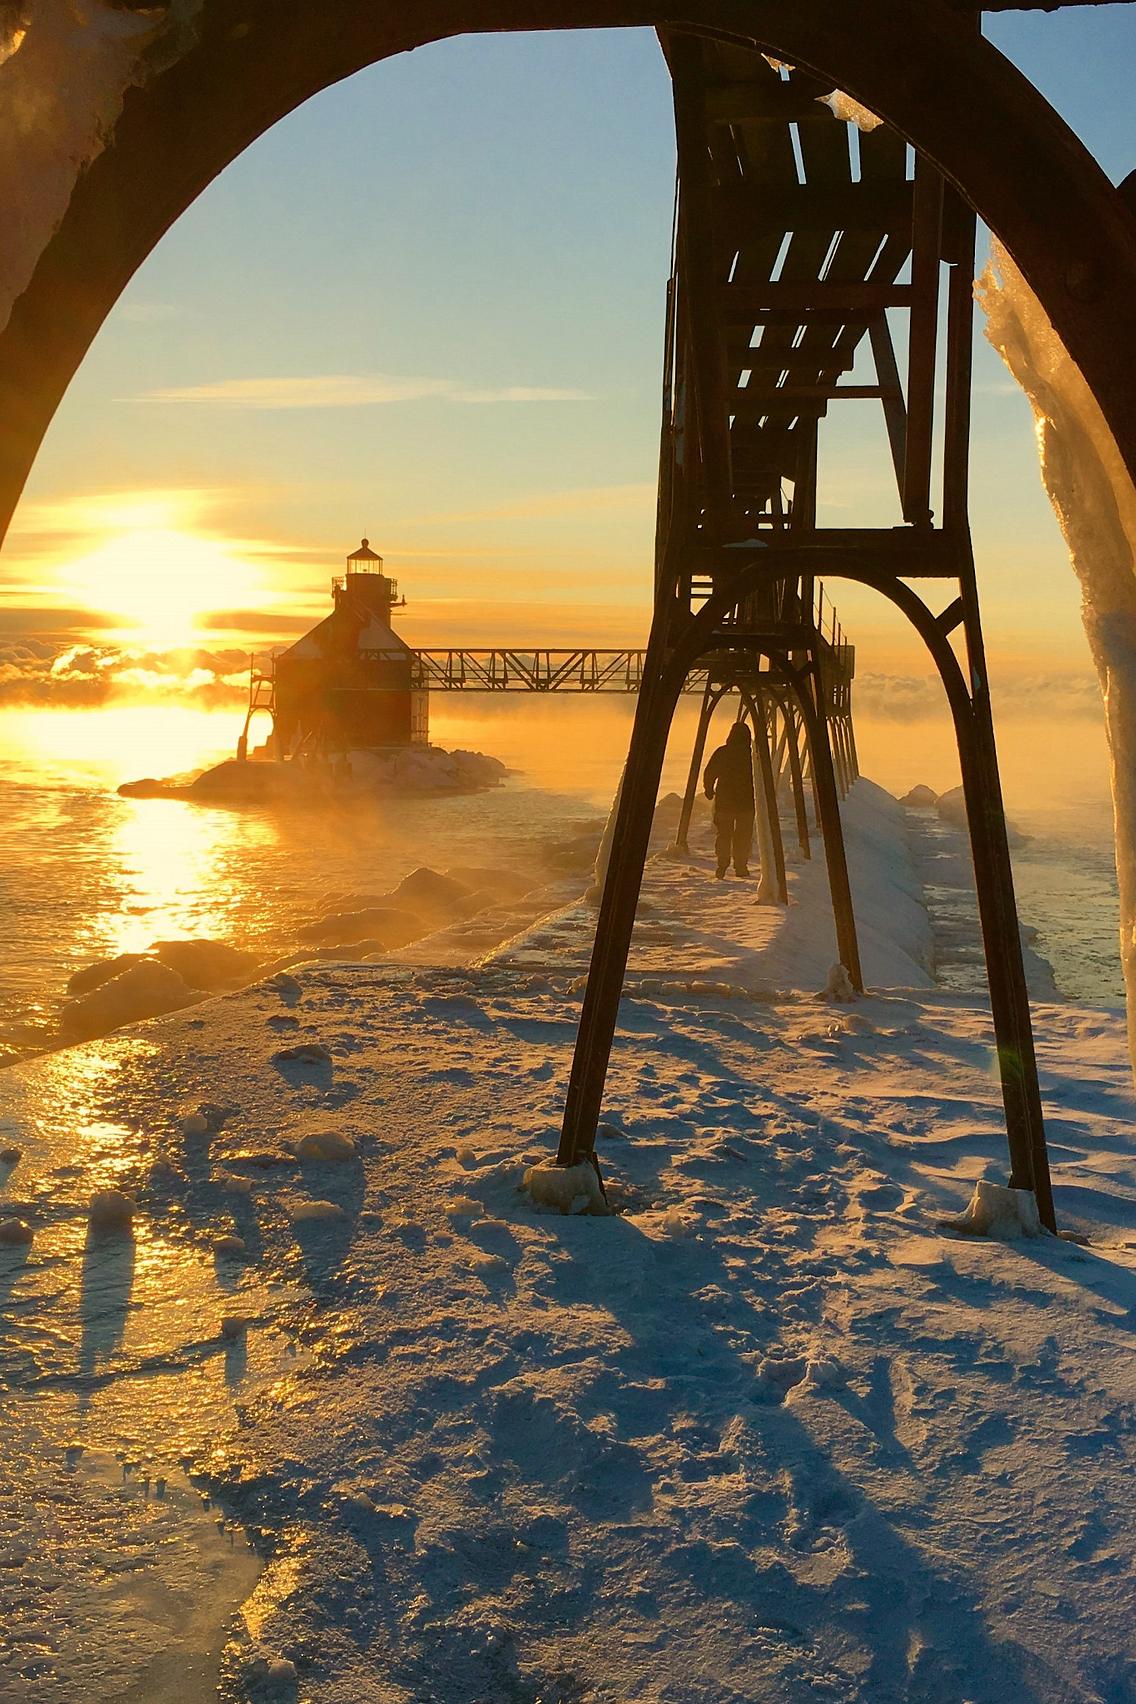 Door County's North Pierhead Light on a frigid winter day